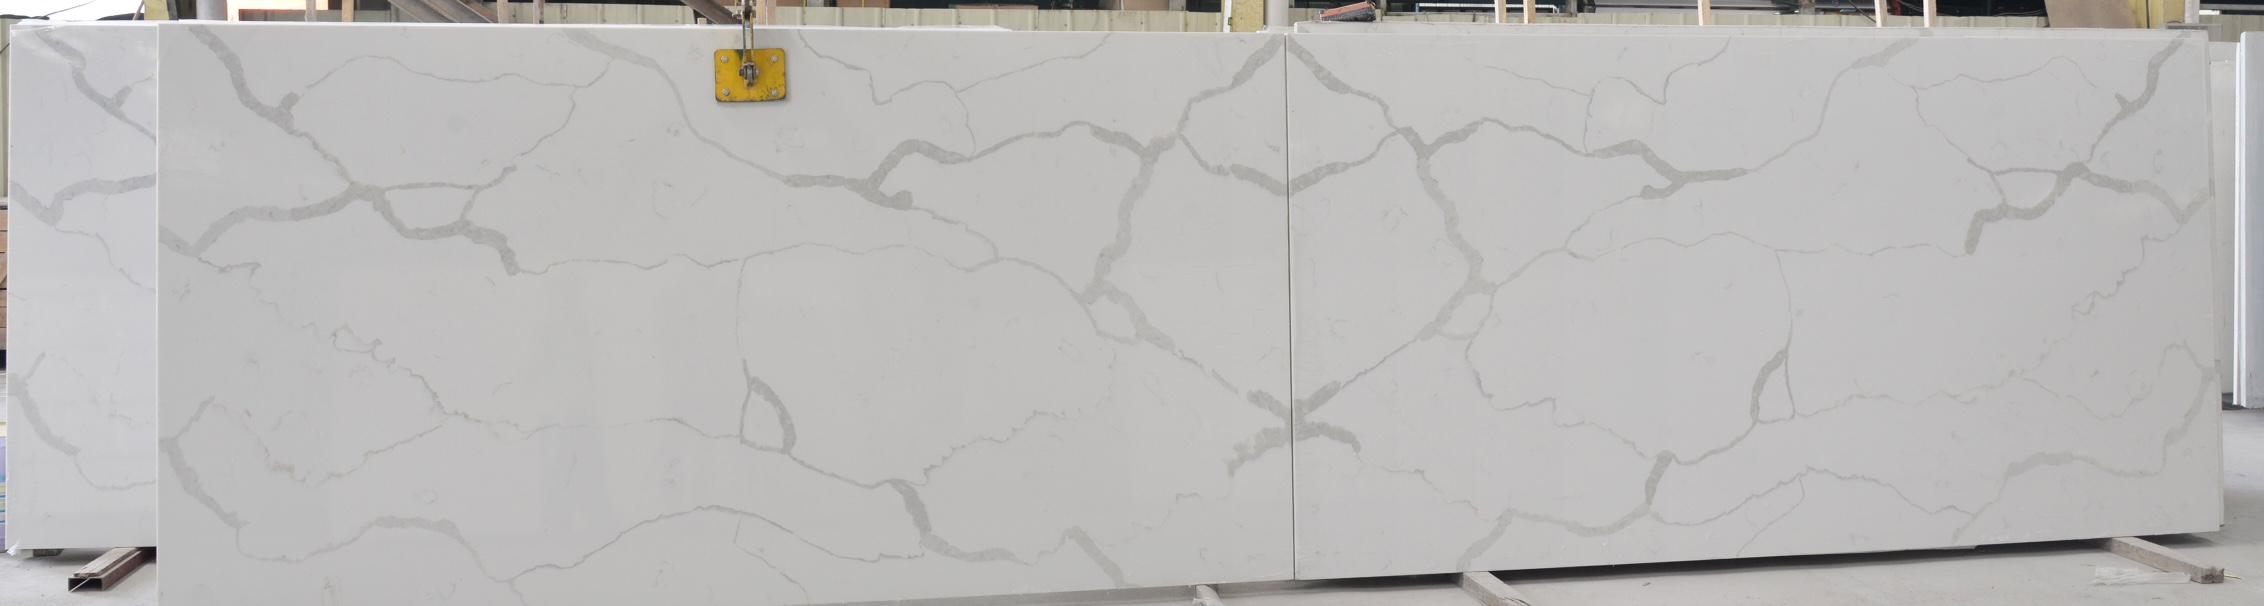 Finest quartz-countertops - Saratoga Springs, NY - Capital Stone Saratoga BB68